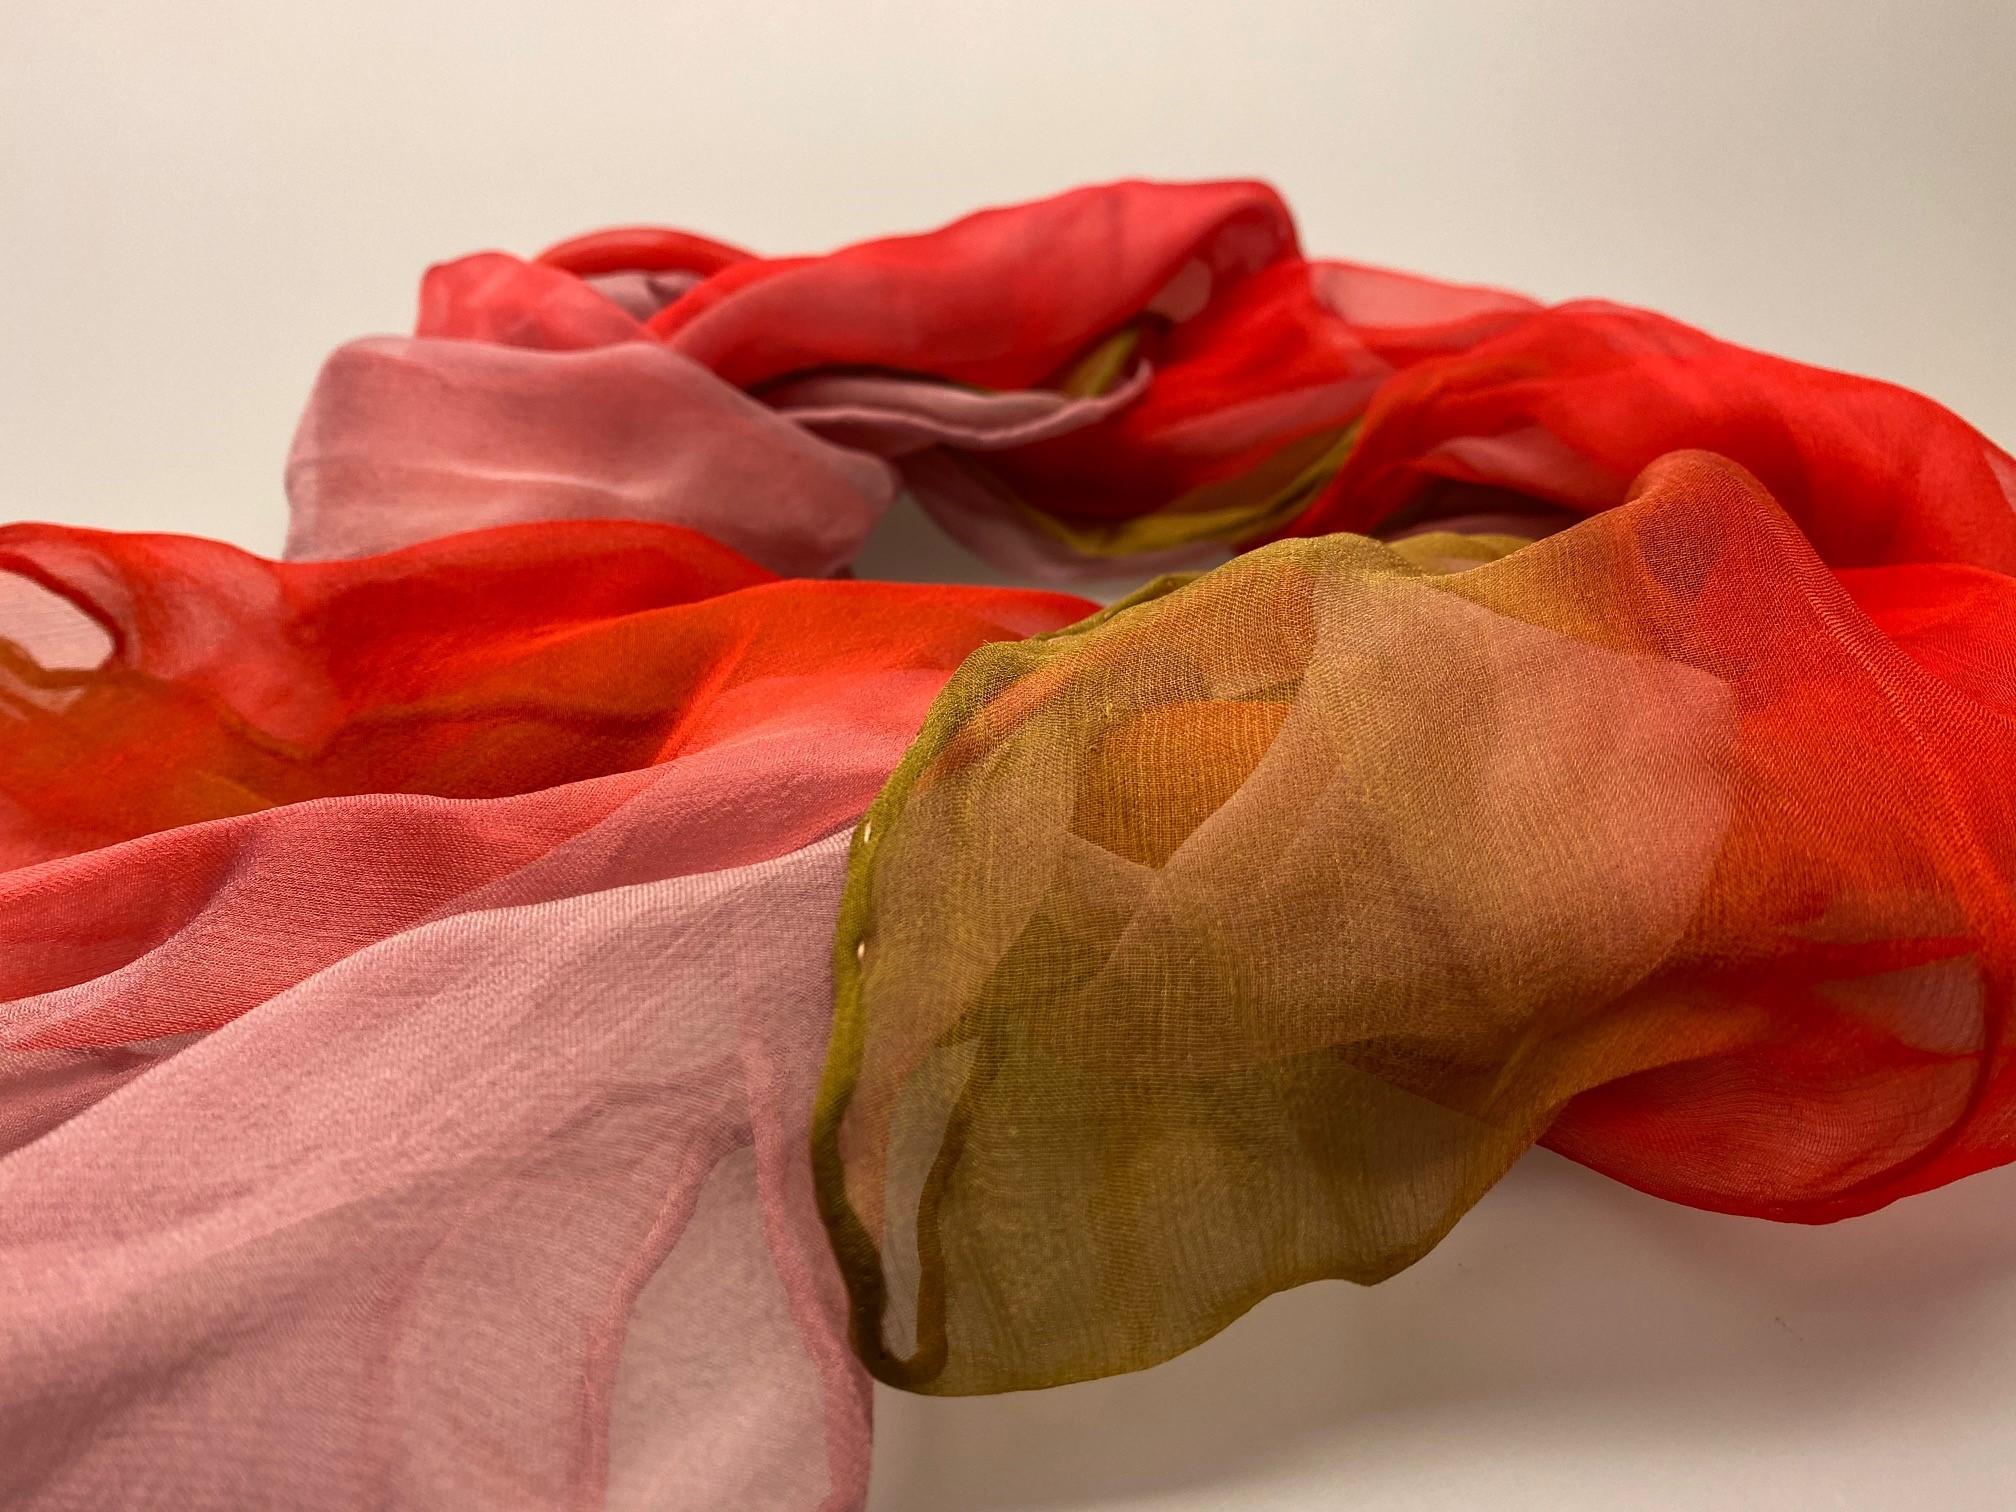 1158-167, Silkechiffon 1163 XL - Rød/Rosa/Grøn, rosa, silke, ren silke, silketørklæde, silkechiffon, let, stort, volumen, sjal, stola, fest, festtøj, elegant, kvalitet, flot, kor, gave, gaveide, rund fødselsdag, biti, ribe